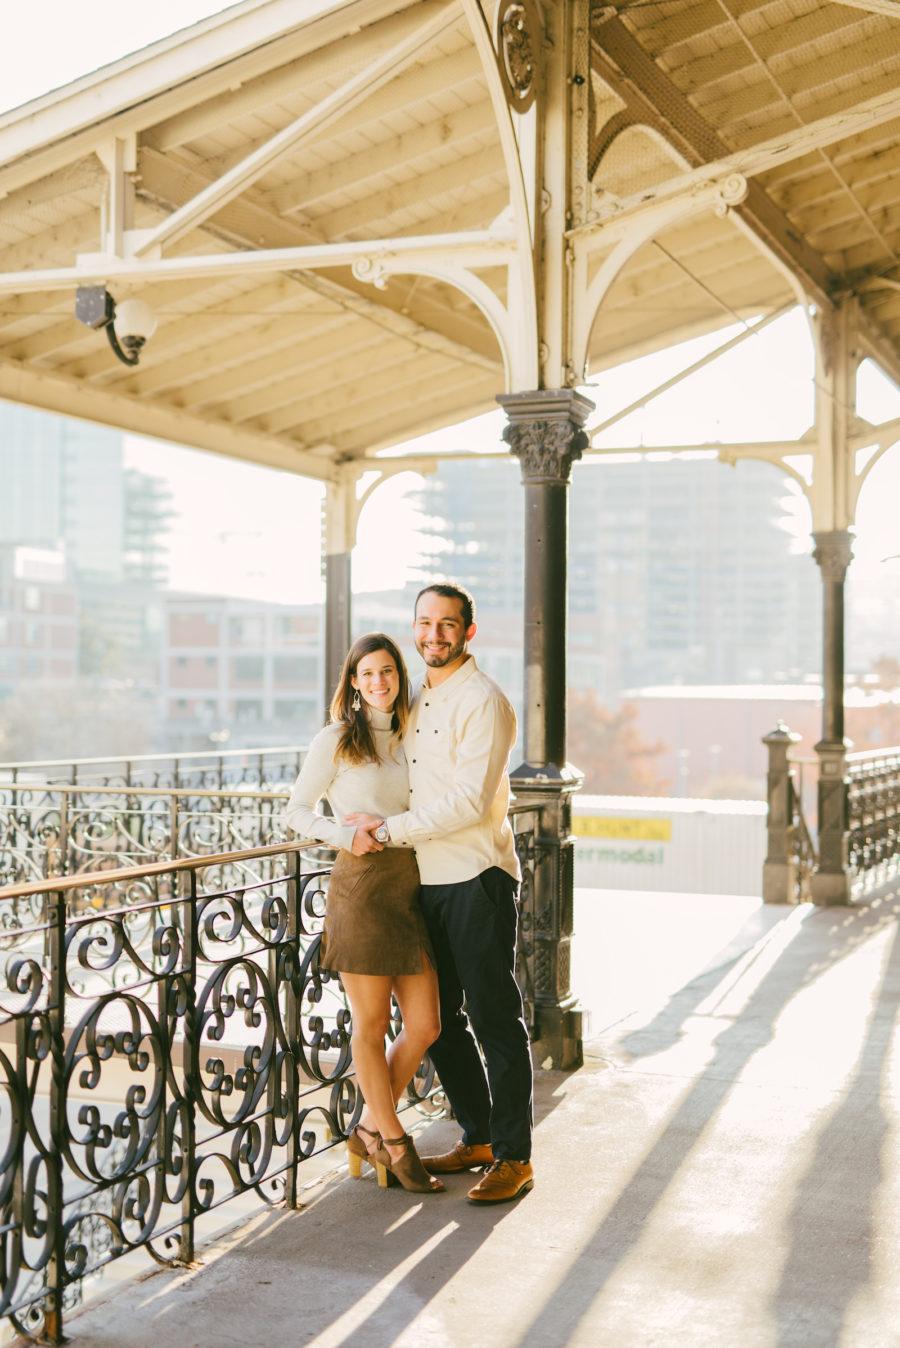 Nashville Wedding Photographer featured on Nashville Bride Guide